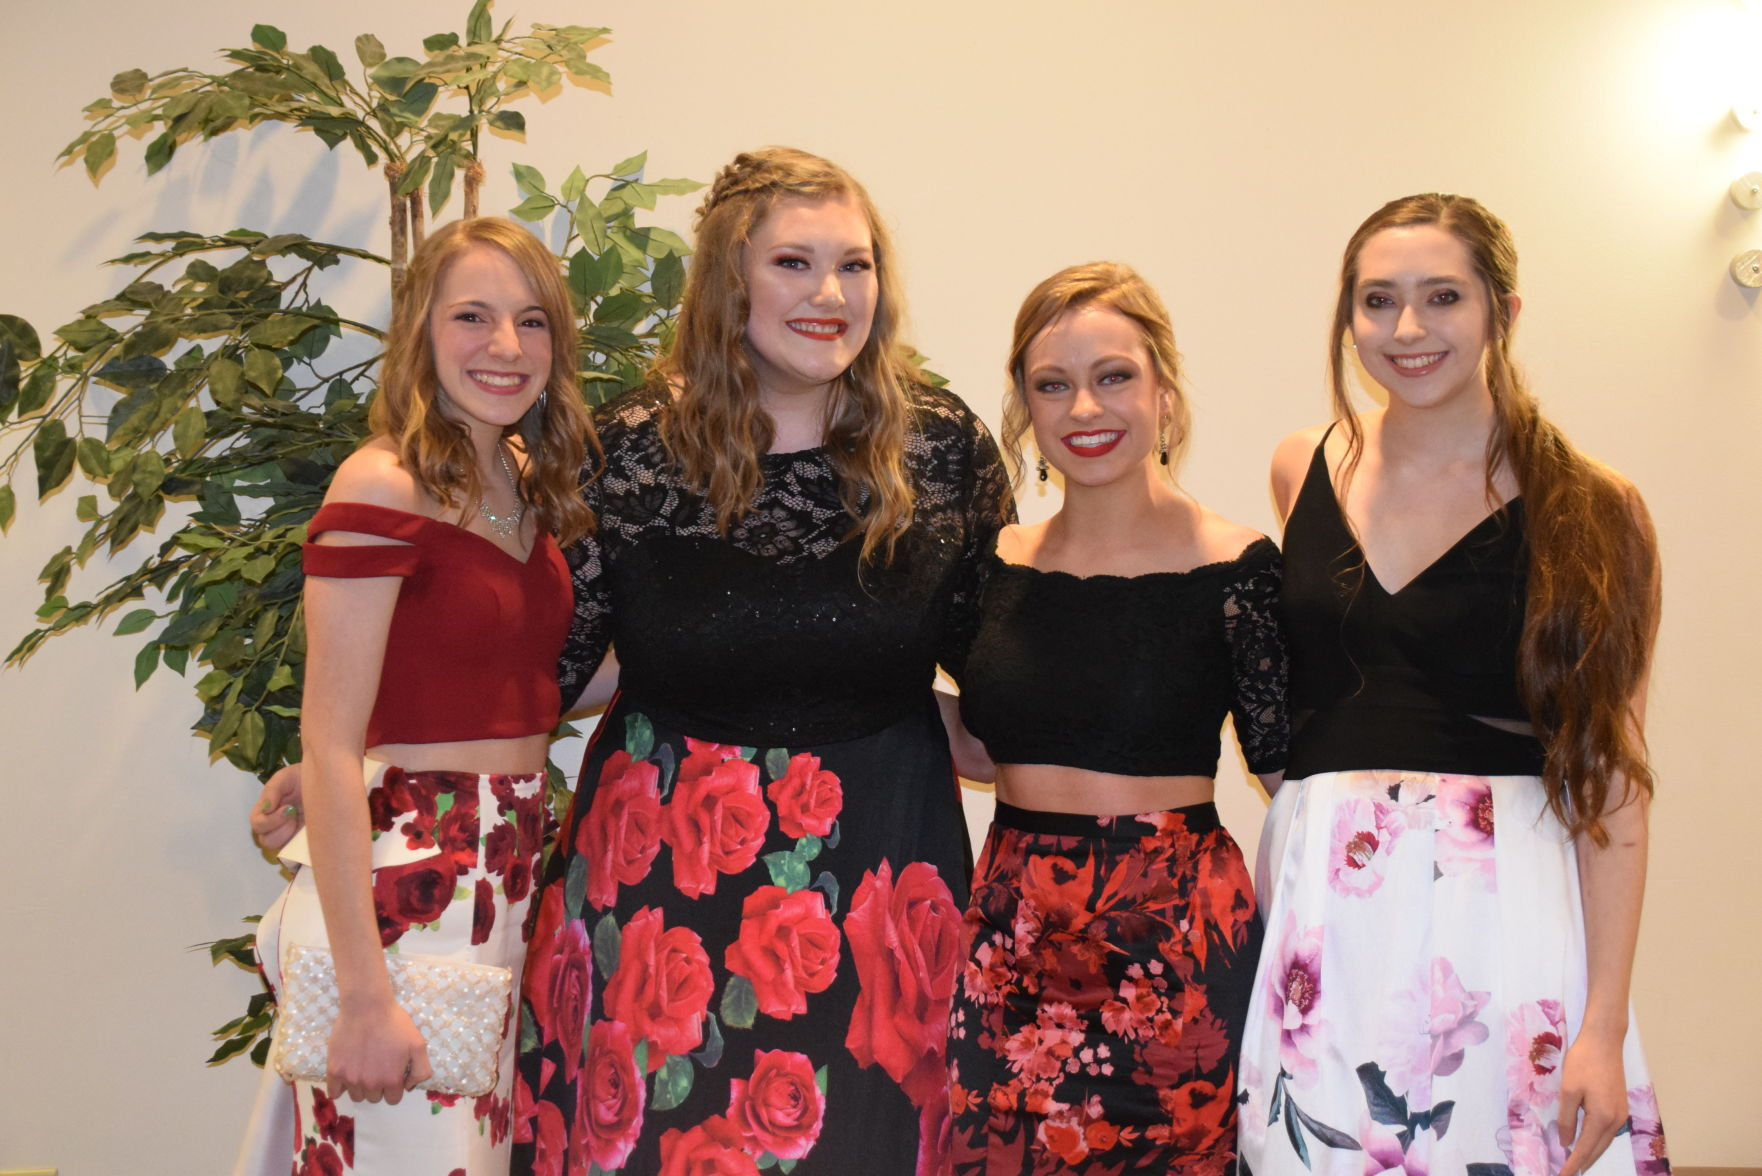 GALLERY: Lexington High School Prom 2019